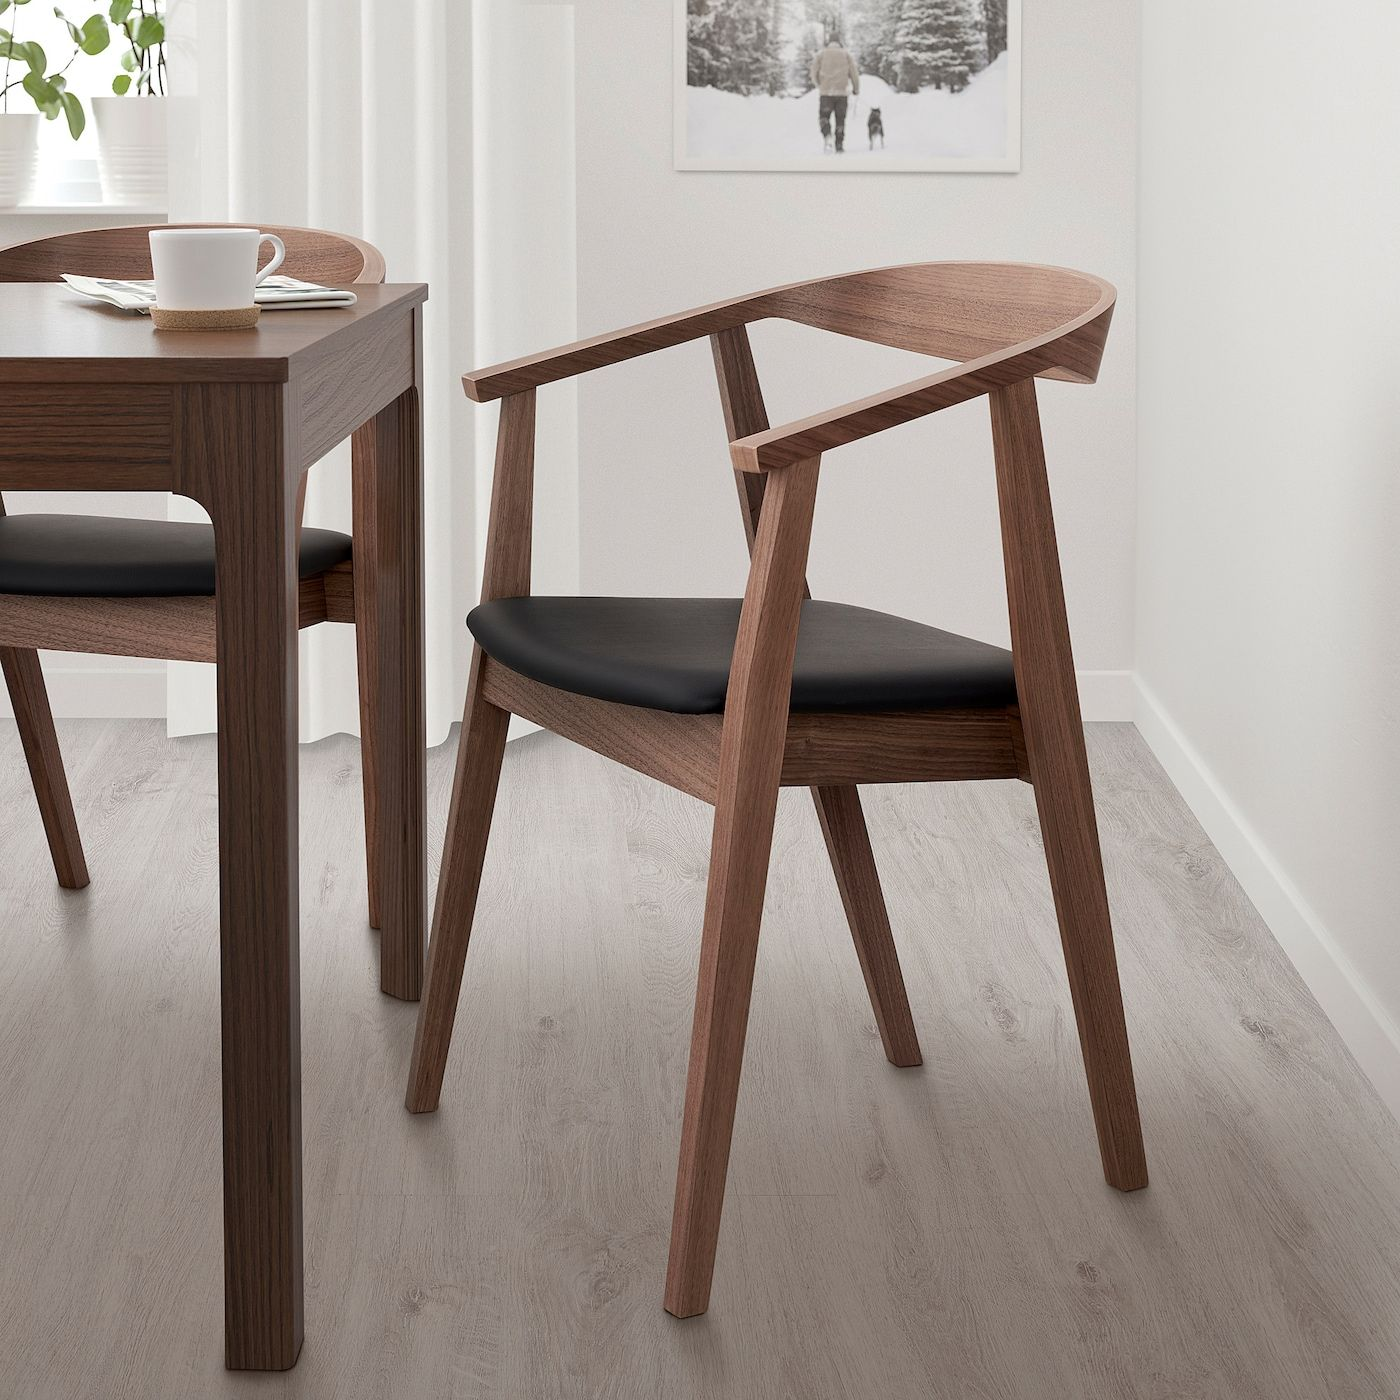 Stockholm Chair Walnut Walnut Living Room Ikea Dining Chair